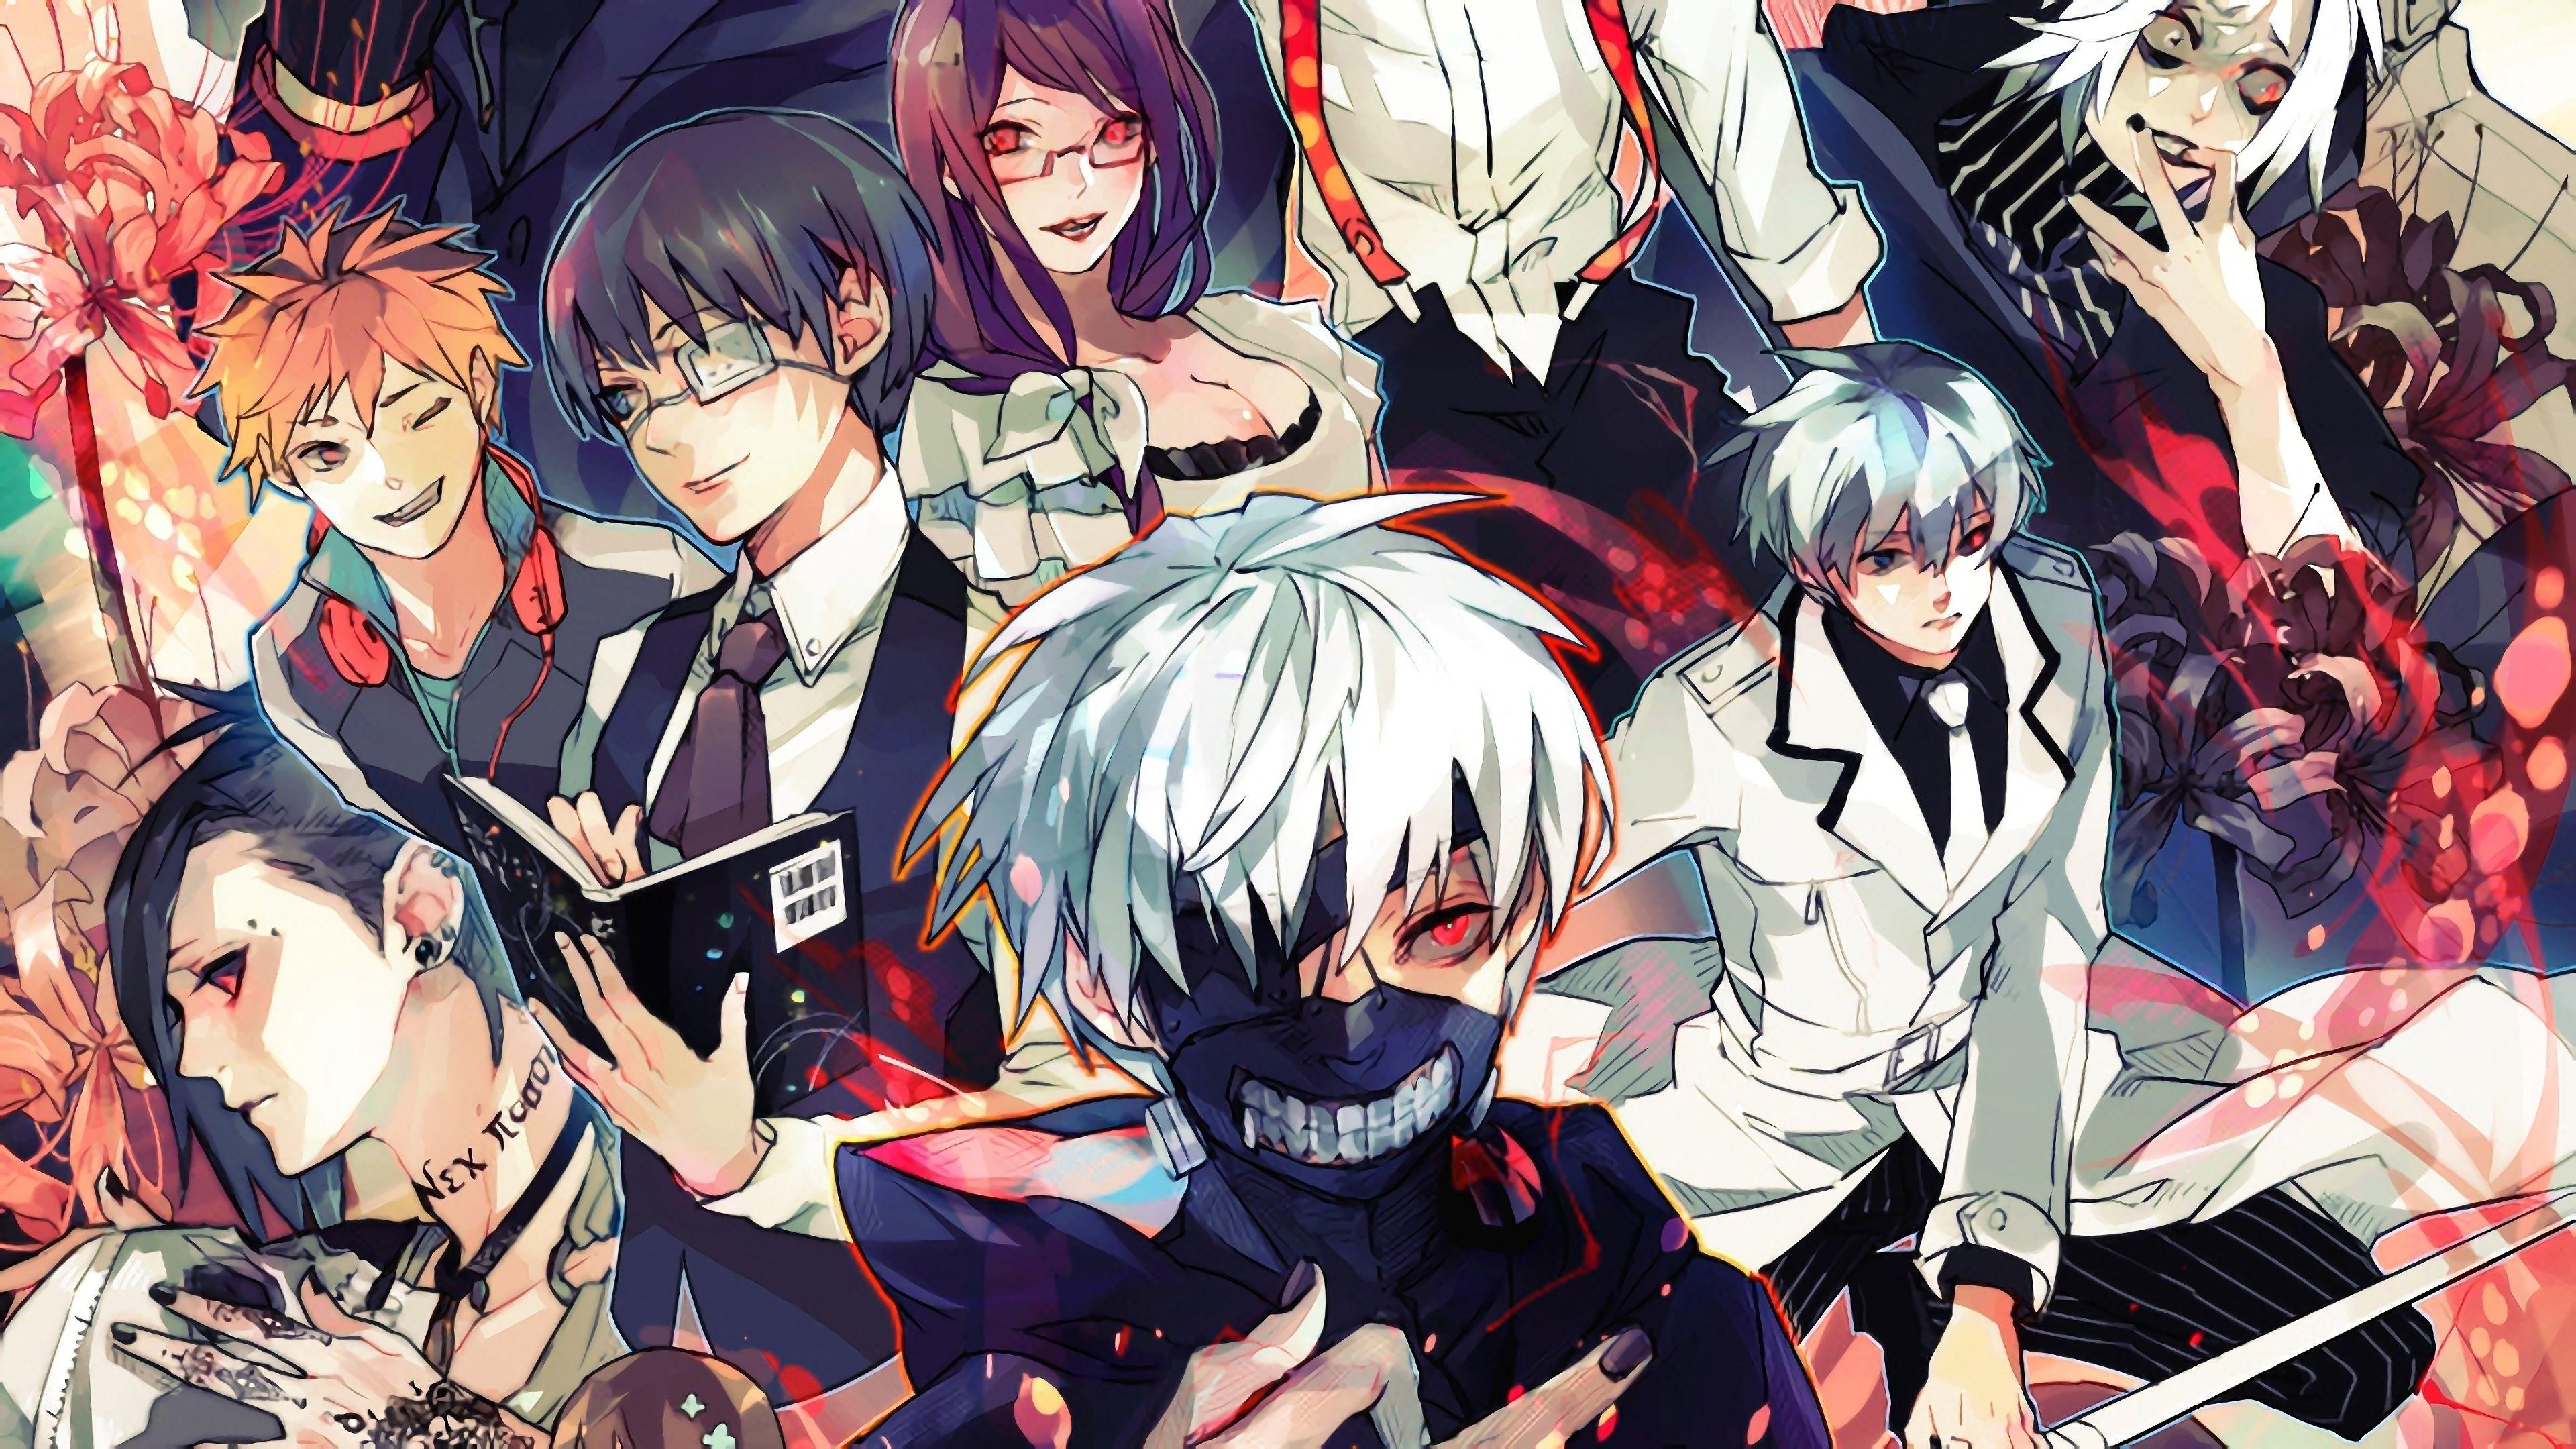 Anime Tokyo Ghoul Kaneki Ps4 Wallpapers - Wallpaper Cave